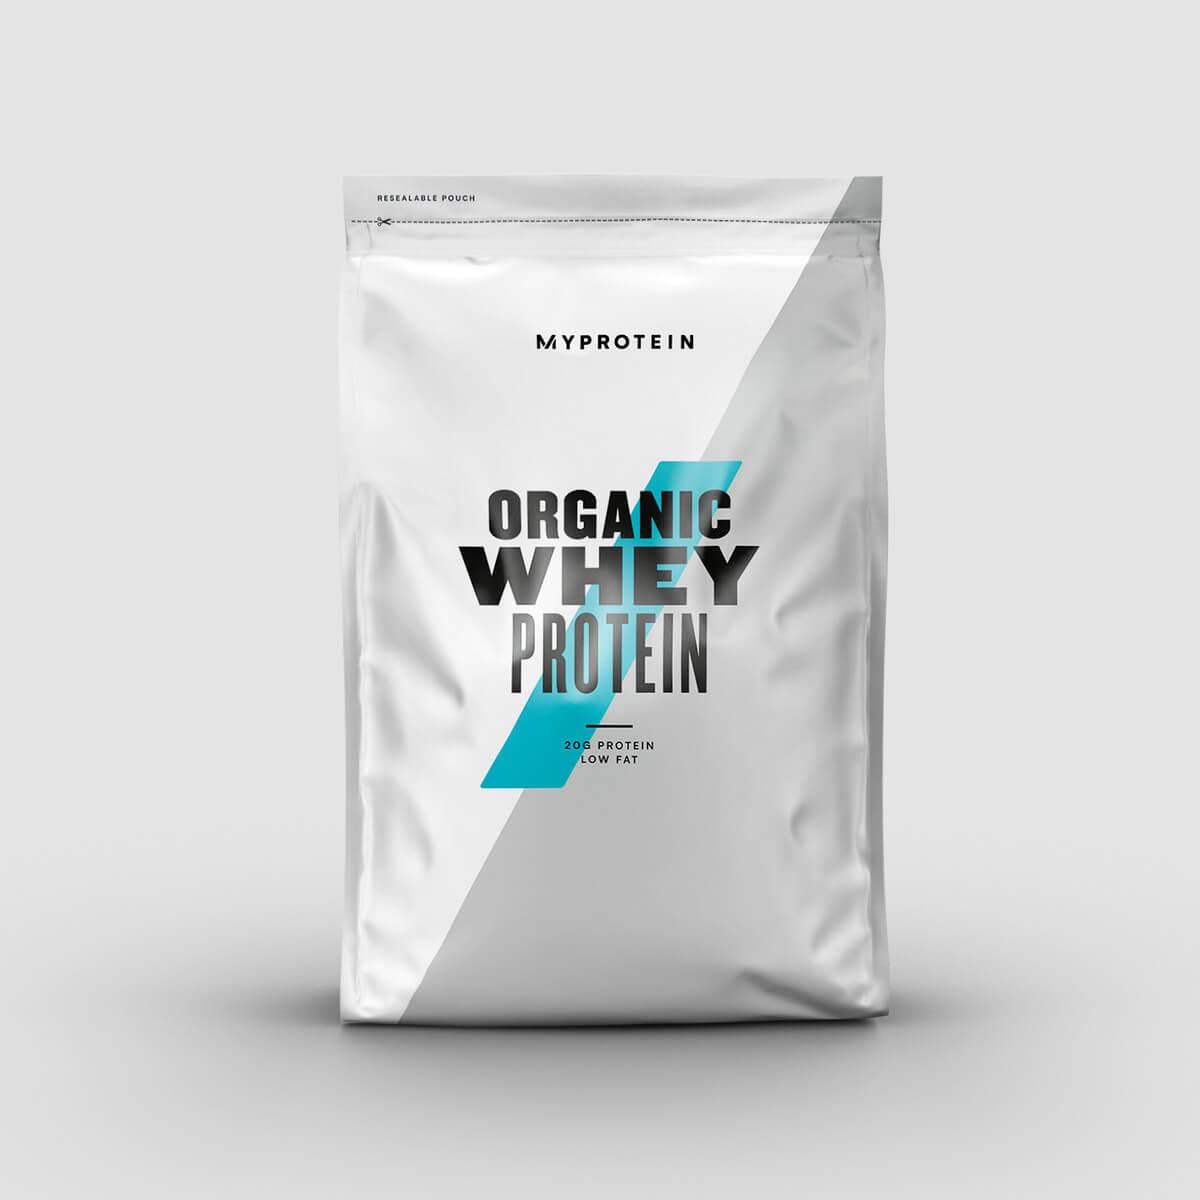 Myprotein Protéine de Whey Bio - 500g - Sans arôme ajouté